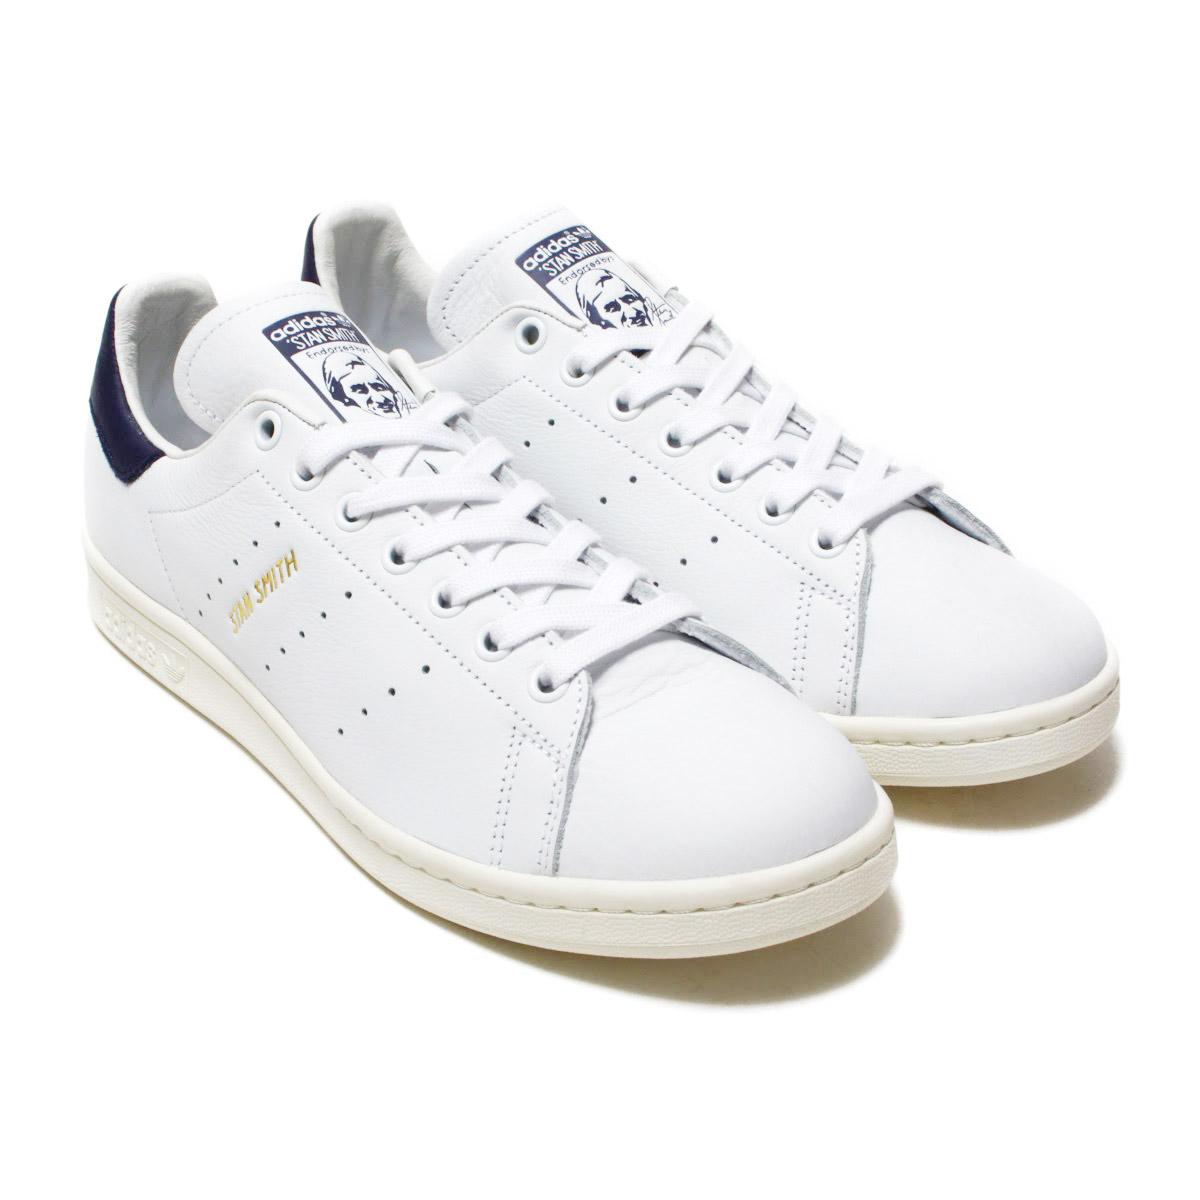 timeless design fcd79 2bd94 adidas Originals STAN SMITH (Adidas originals Stan Smith) Running  White/Running White/Noble Ink 18SS-I